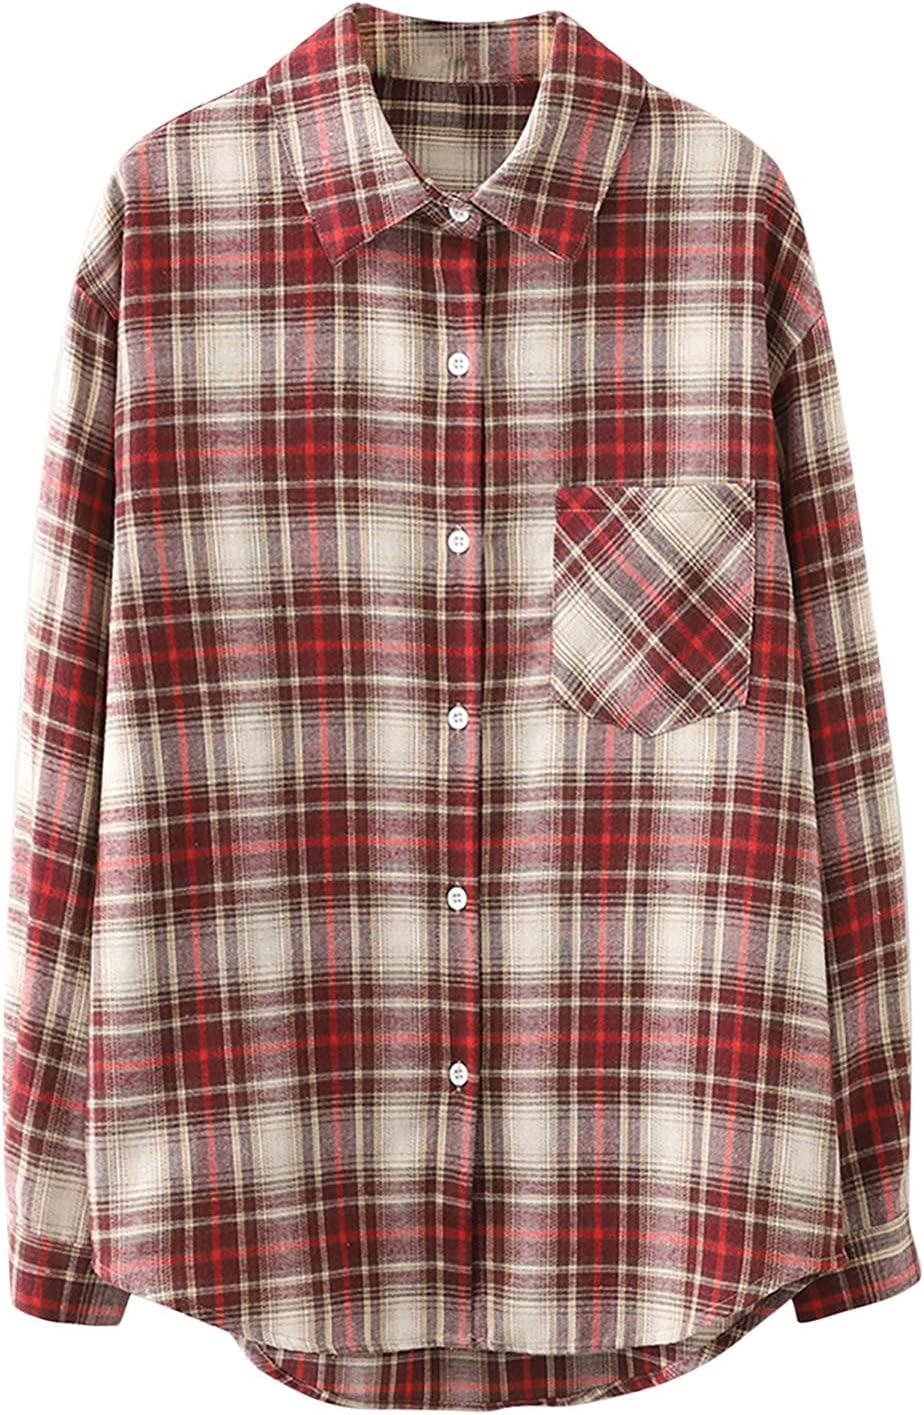 Hatoys Womens Tops Pocket Bust Button Cuffed Plaid Max 85% OFF Shirt San Antonio Mall Sleeve